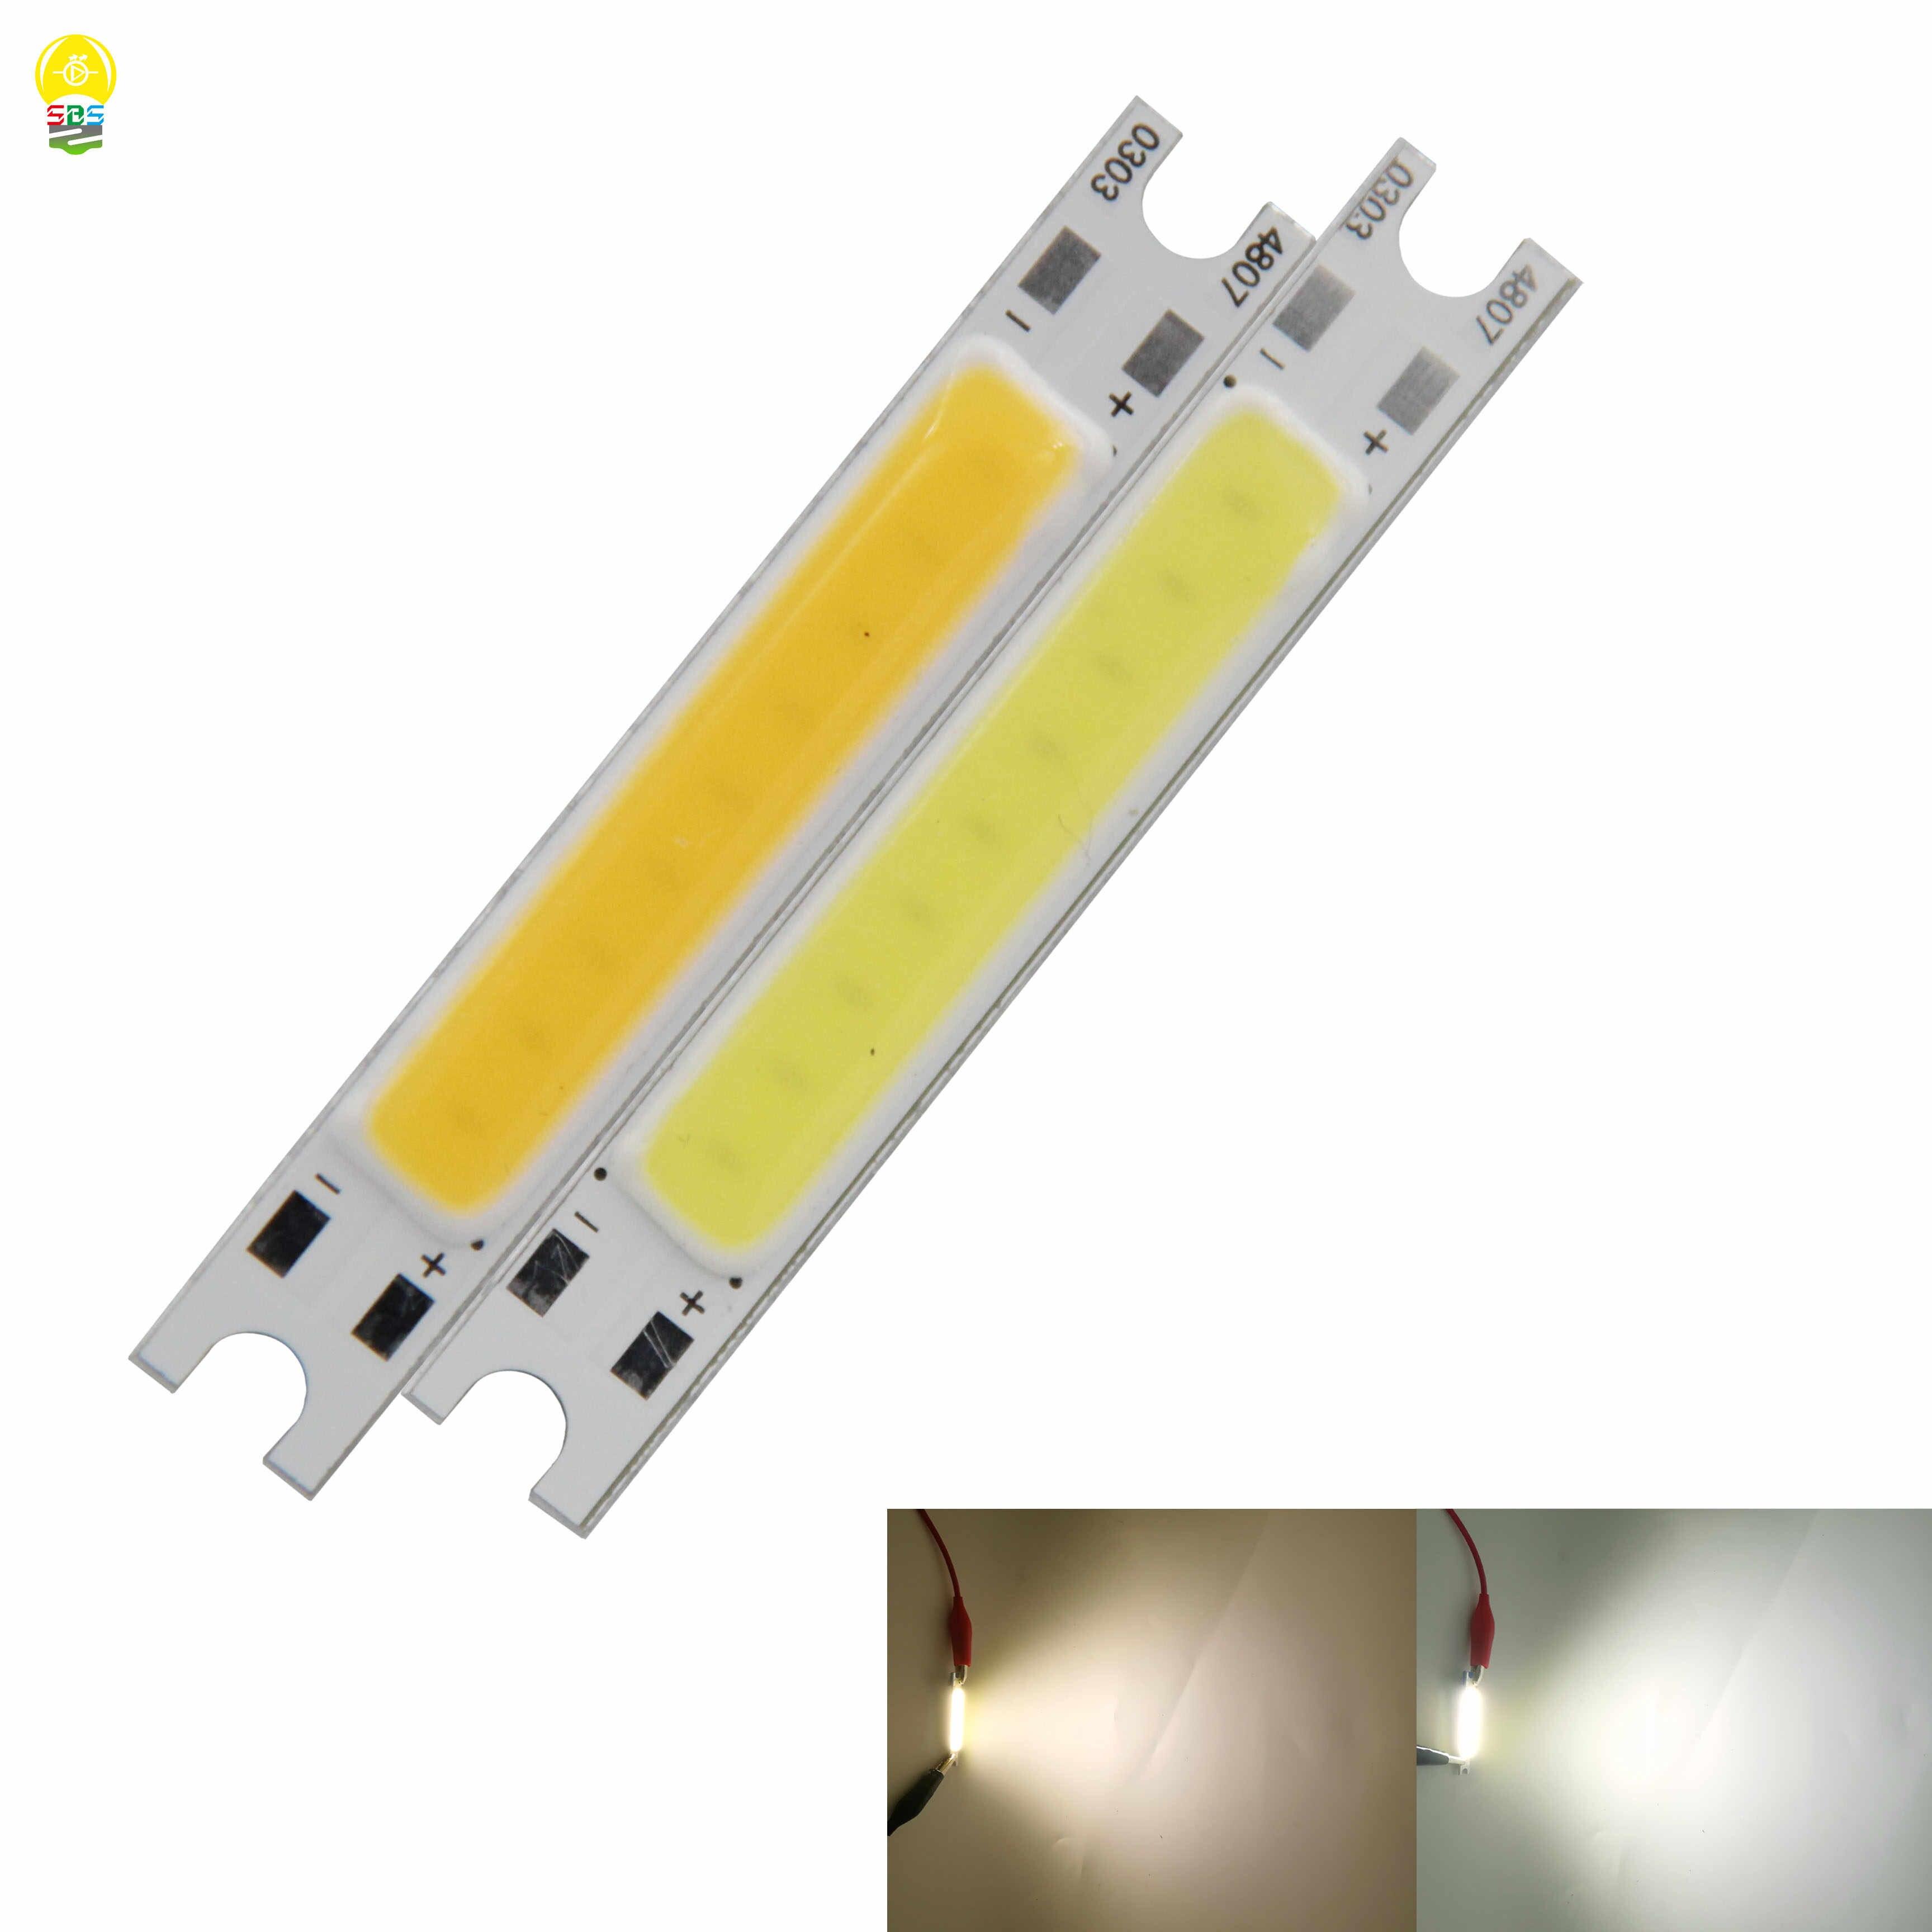 new work wall lamp led light source 48*7mm 3W 9v 300ma cob chip on board led strip for diy light ligtting